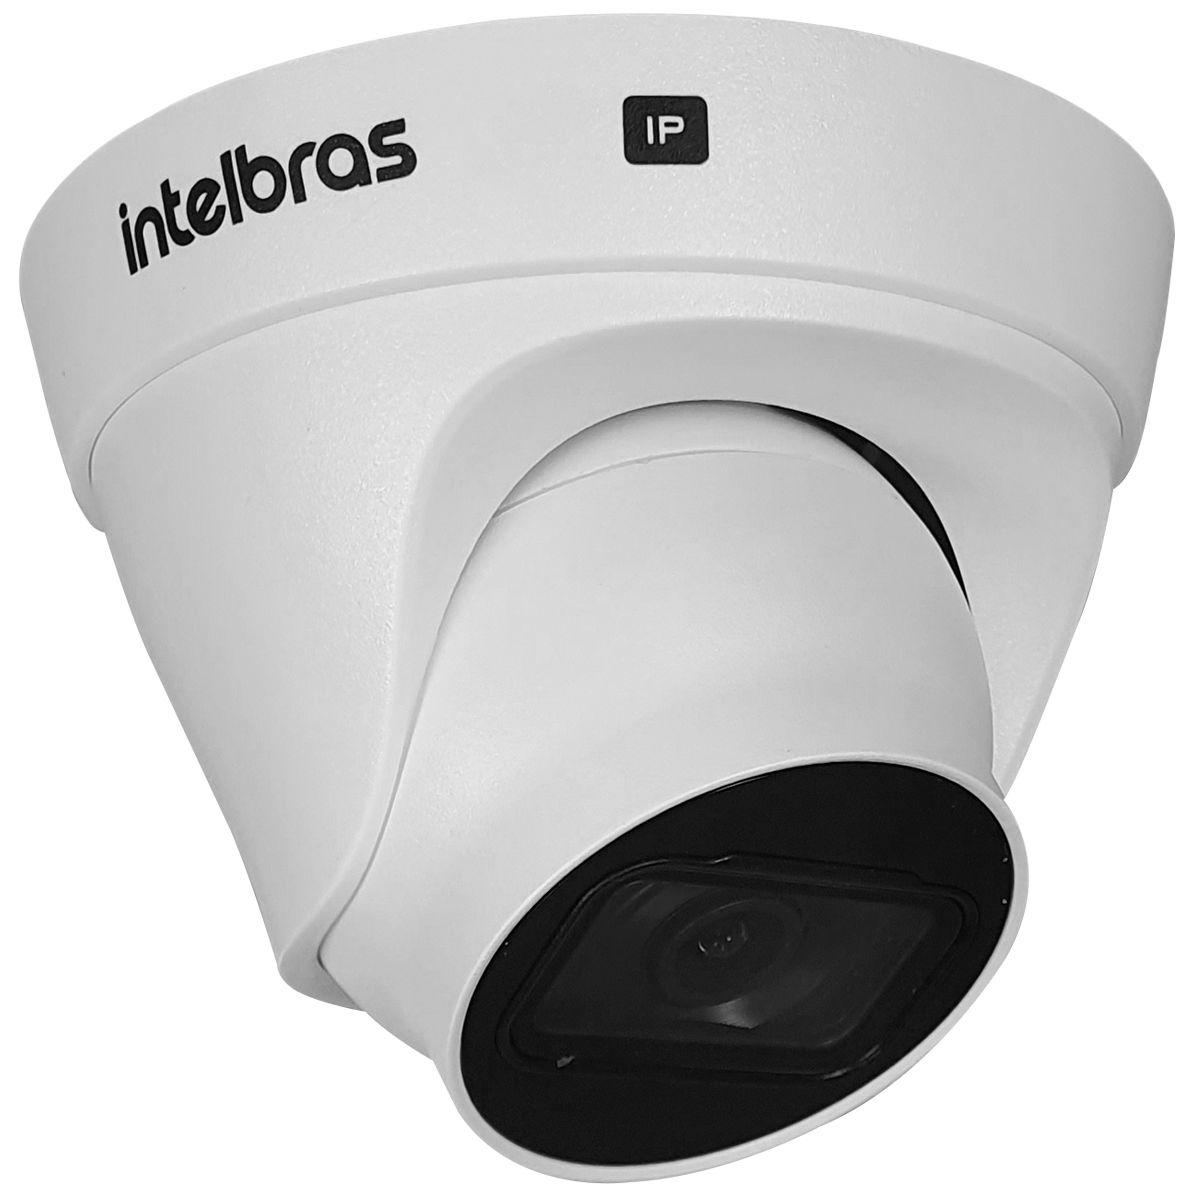 Câmera IP Intelbras VIP 3220 D, Full HD, 1080p, PoE, Lente 2,8mm, Alcance de 20 metros  - Tudo Forte